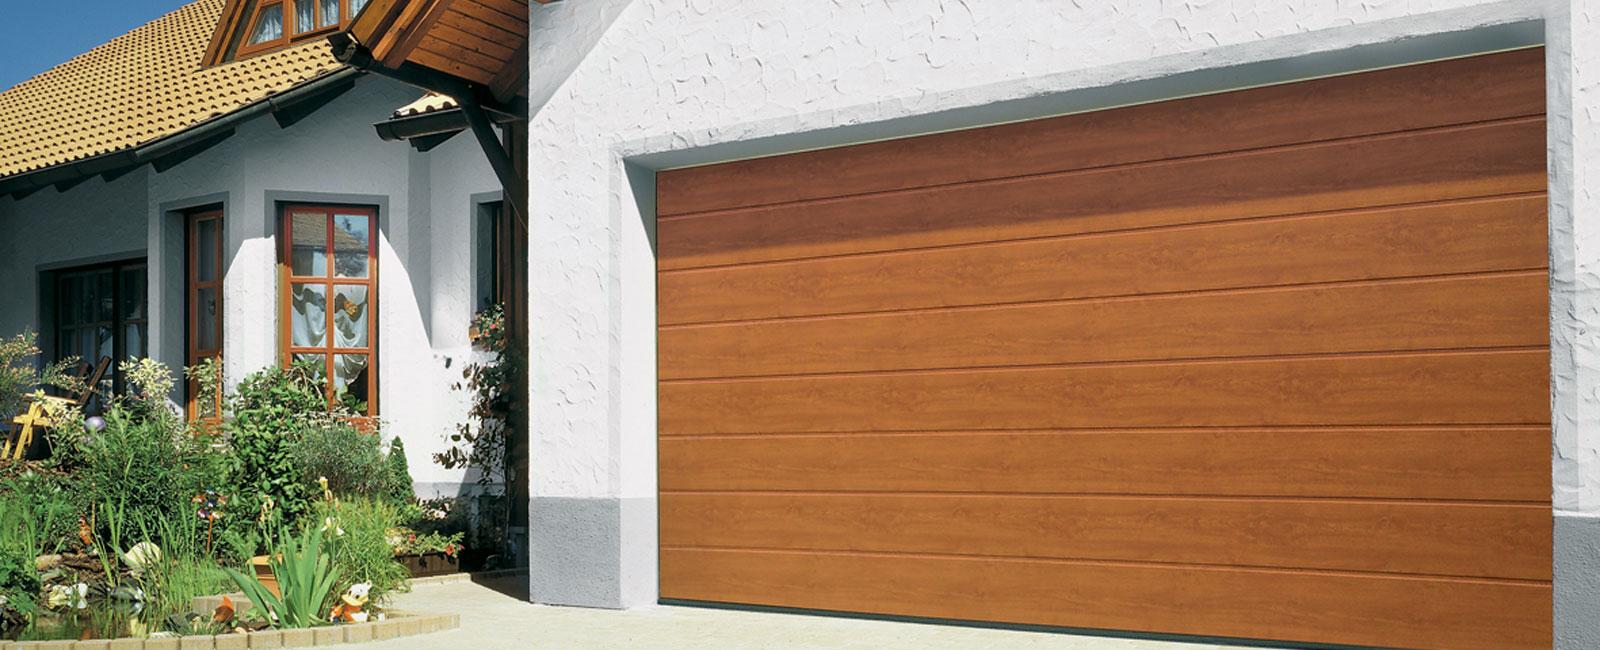 New Hormann Lpu 67 Emsworth Garage Doors